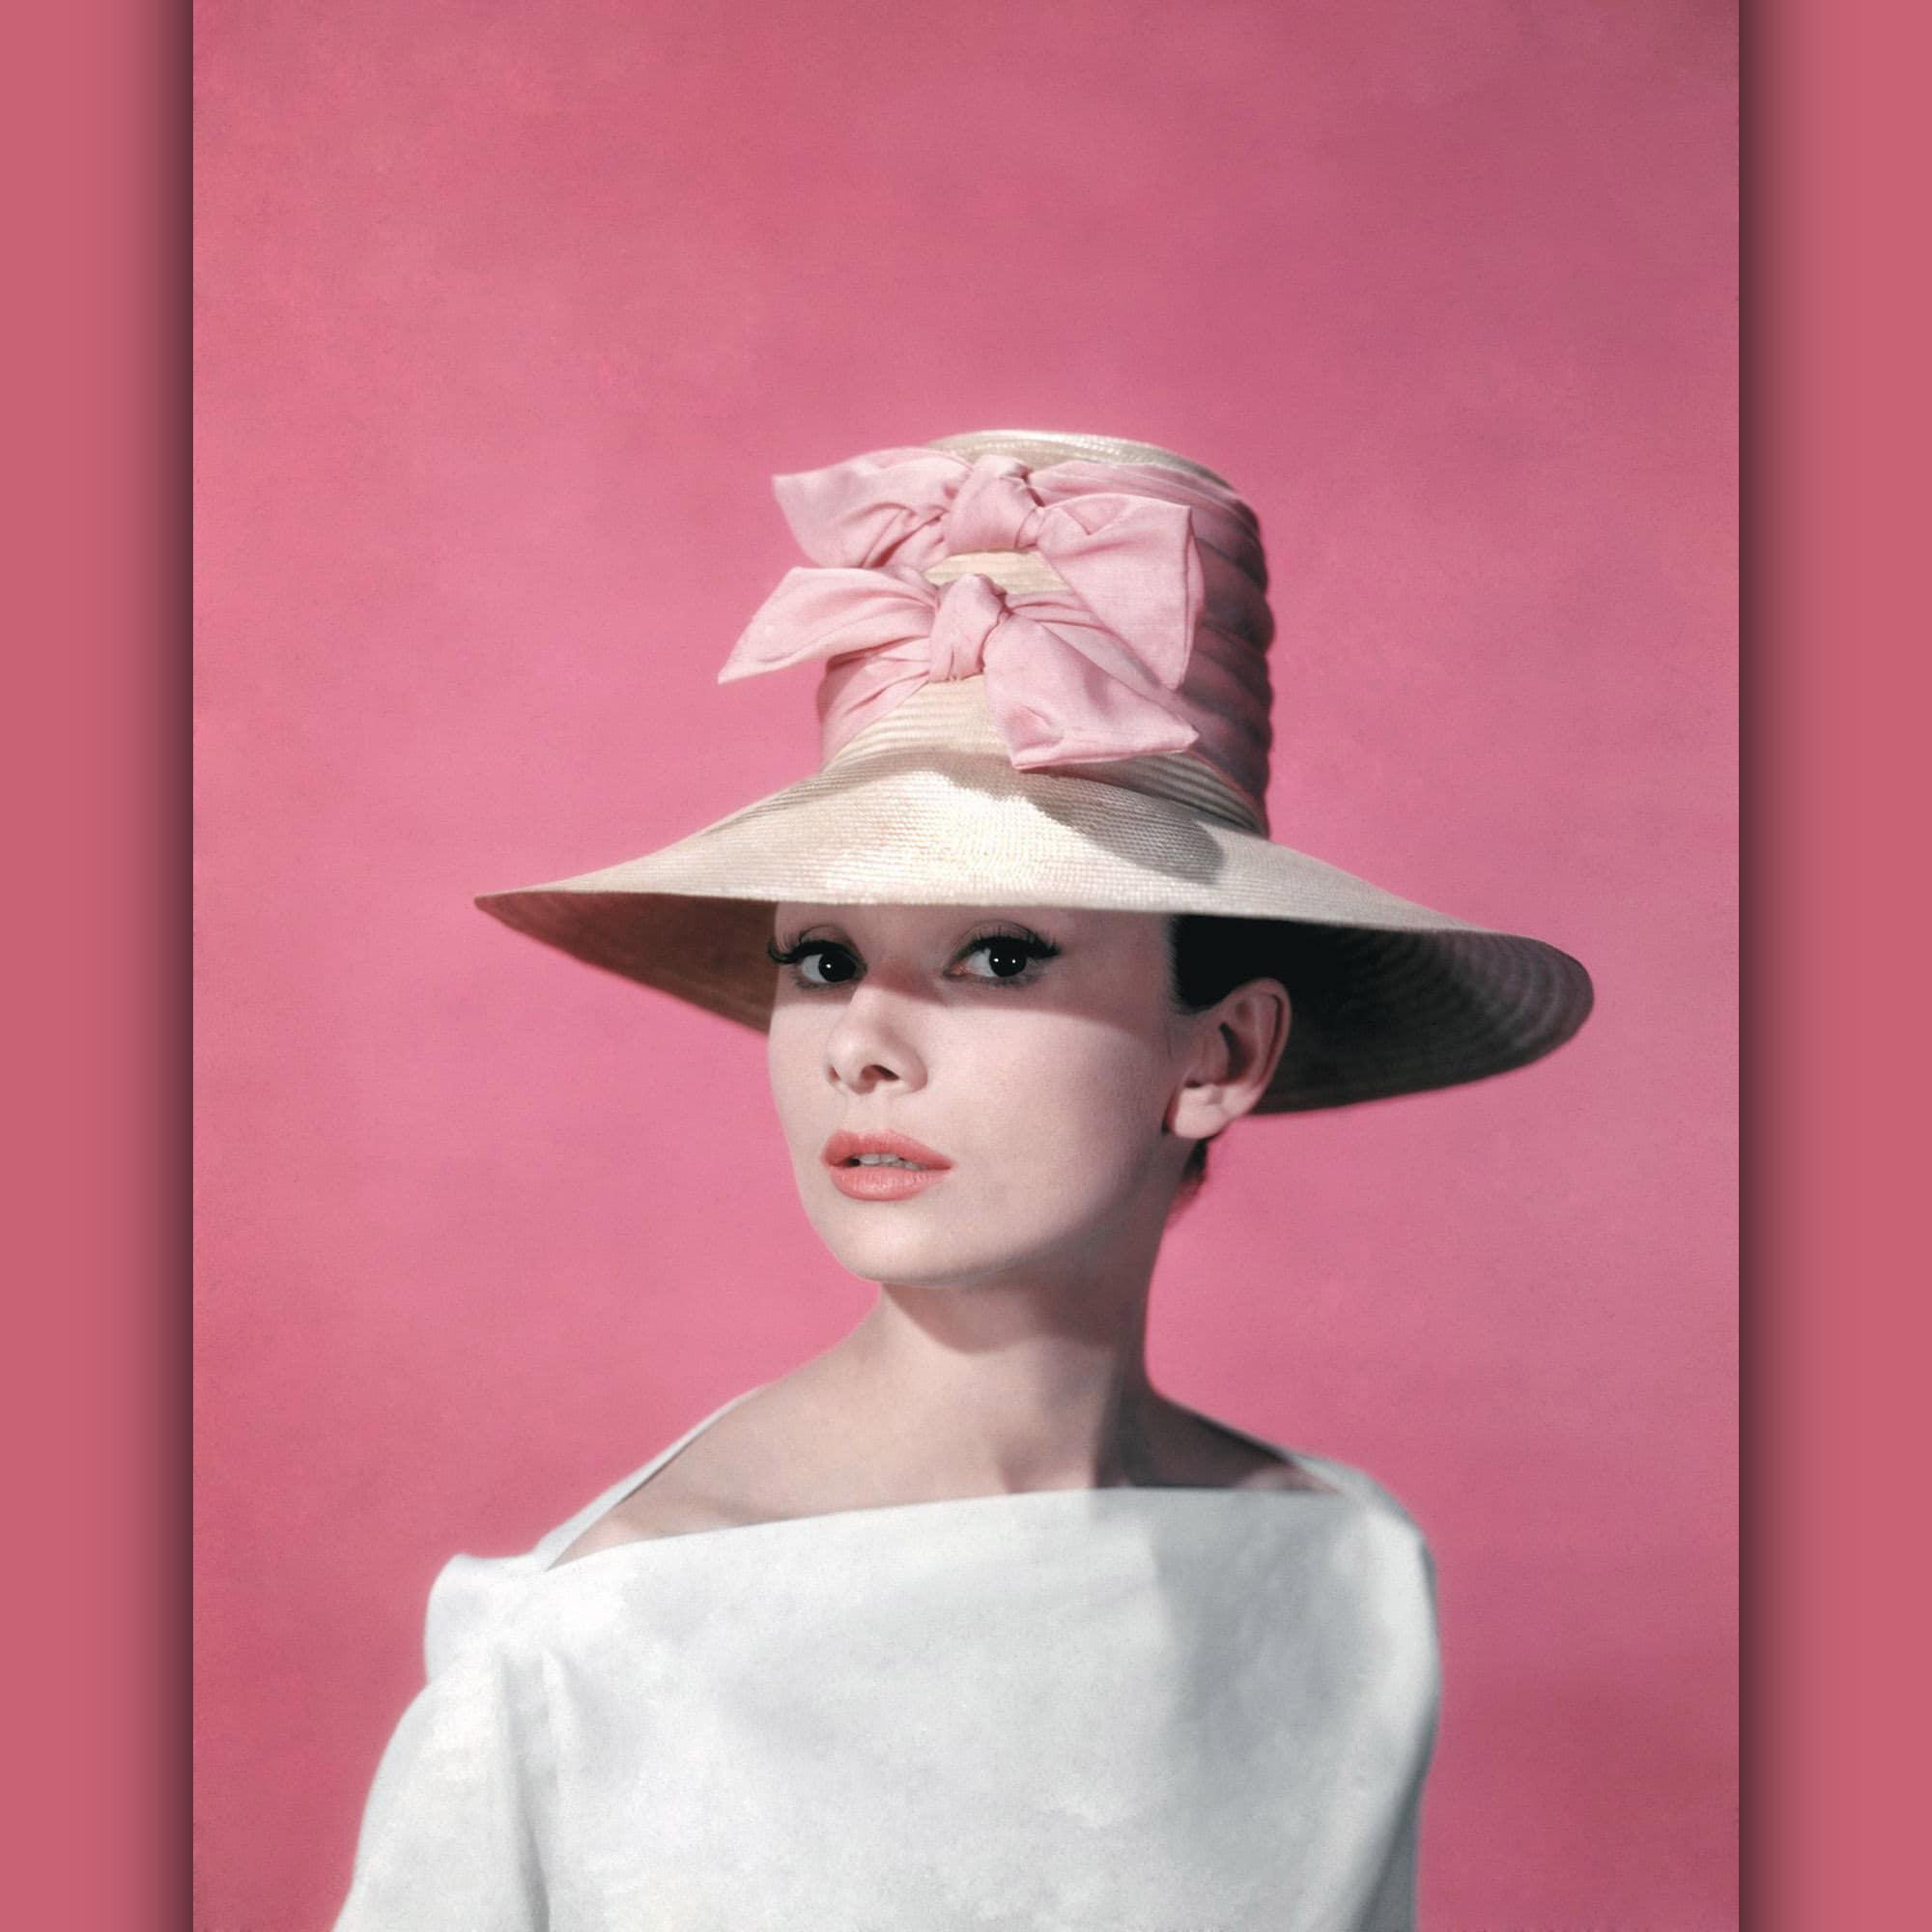 Audrey Hepburn - Fanny Face - movie